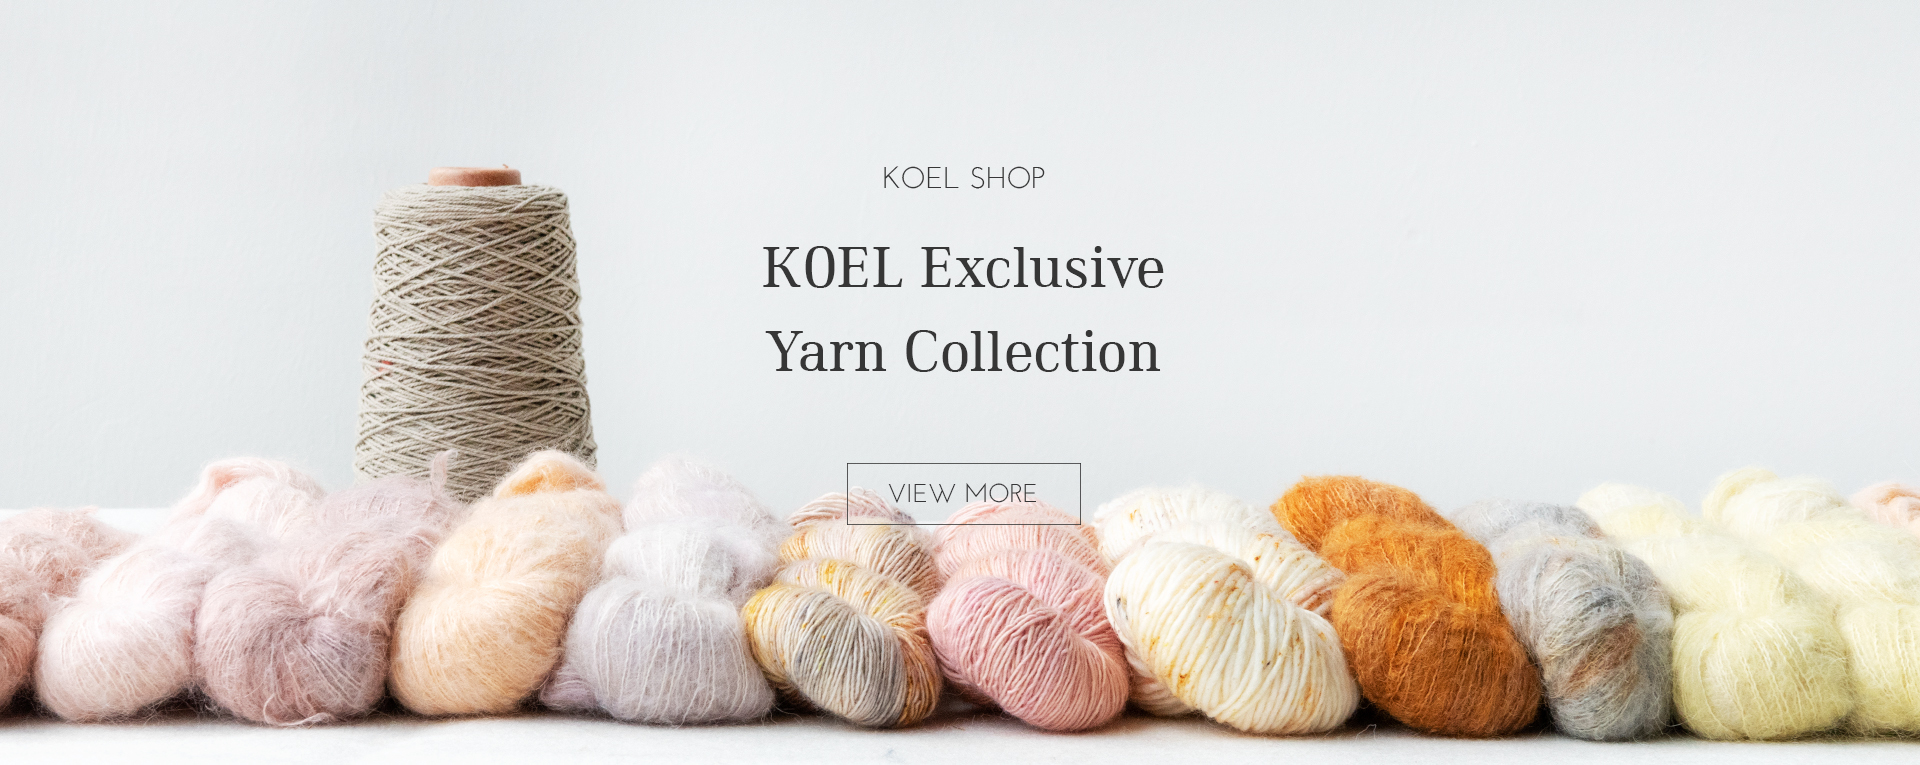 koel shop banner_yarns.jpg